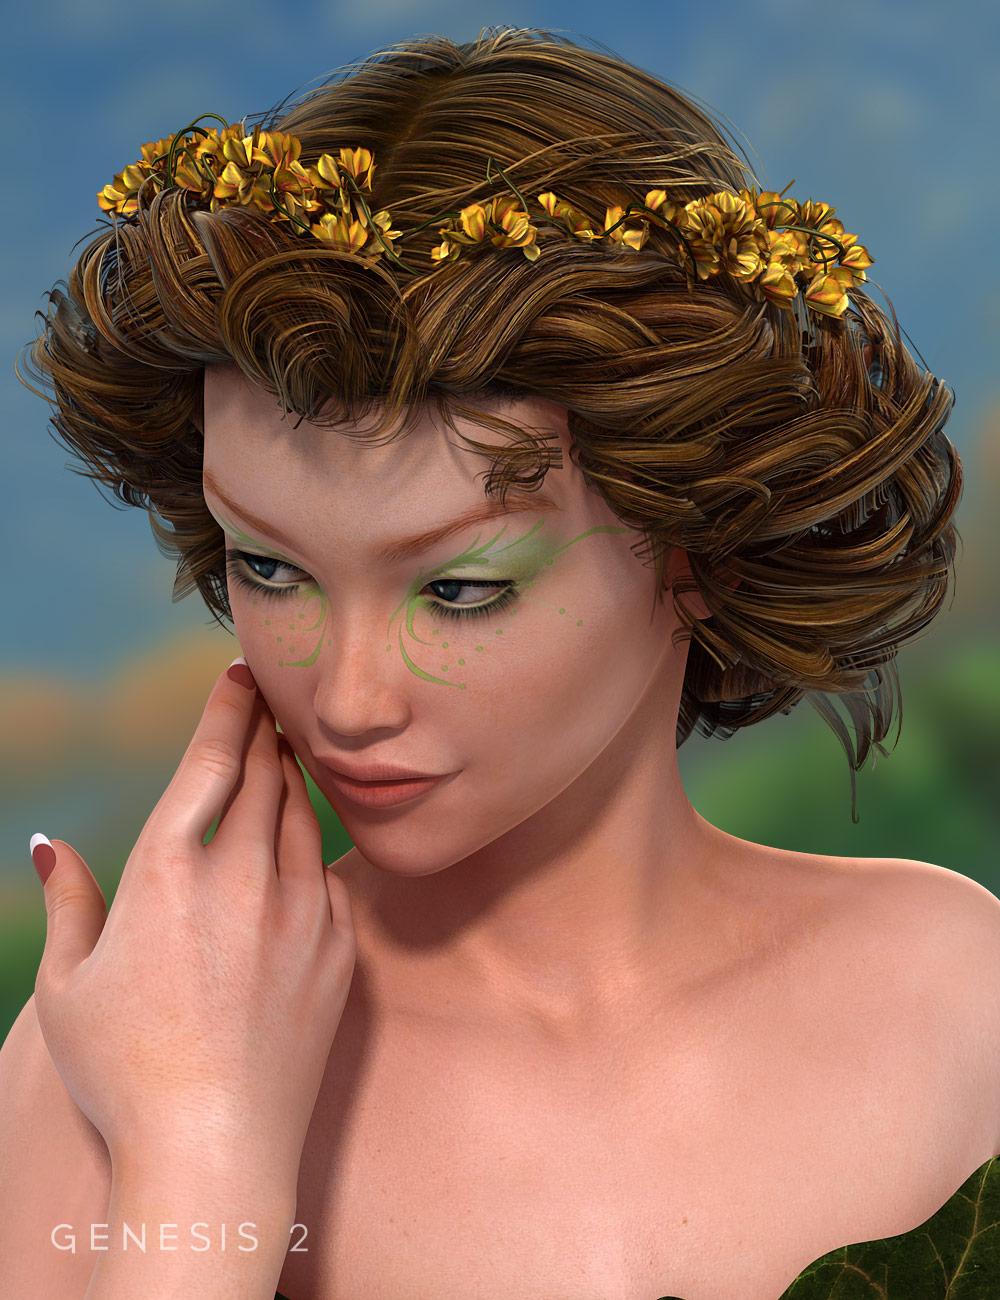 FairyFae Hair for Genesis 2 Female(s) by: goldtassel, 3D Models by Daz 3D